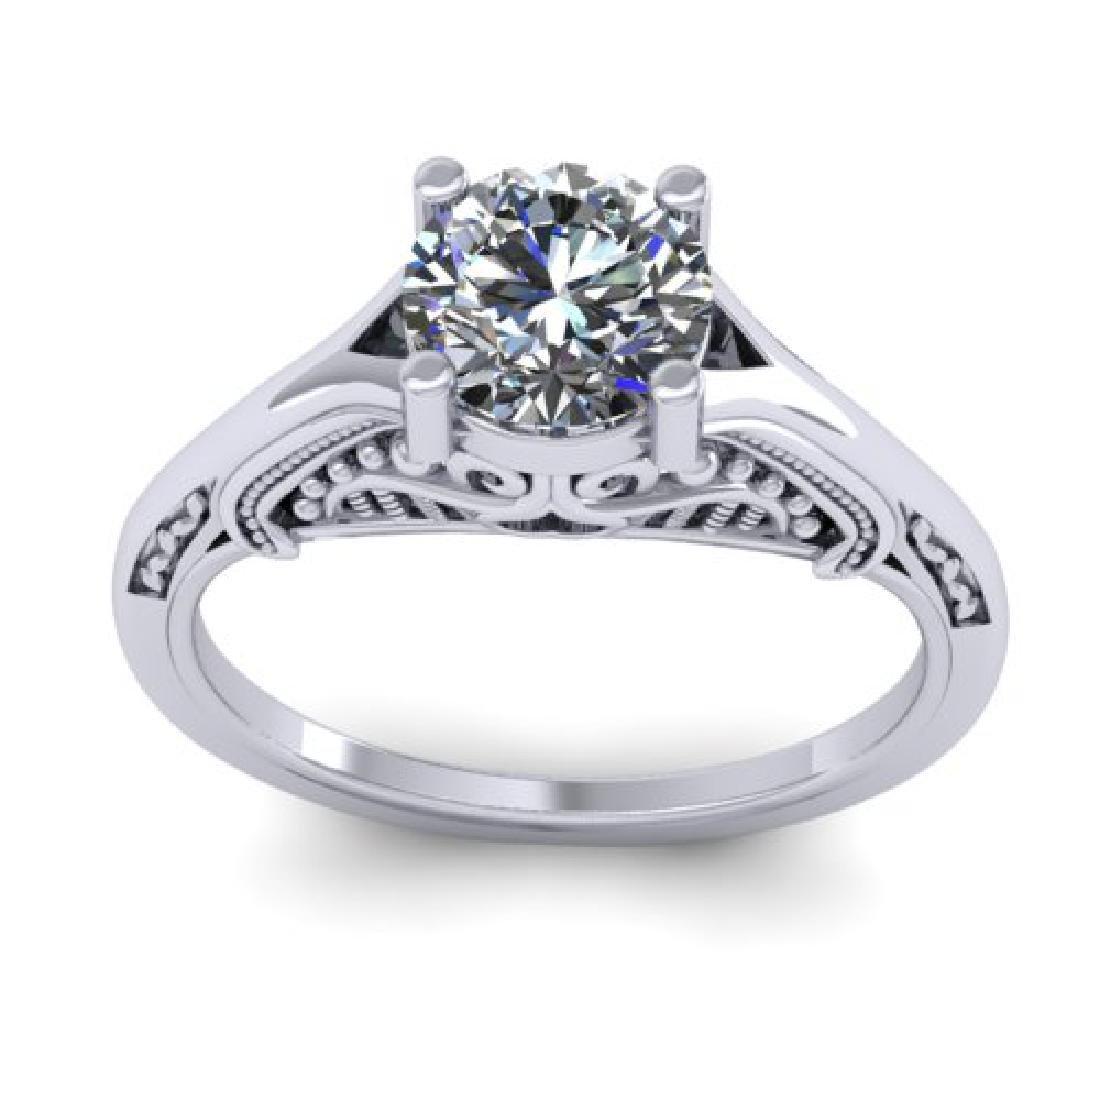 1 CTW Solitaire Certified VS/SI Diamond Ring 18K White - 3